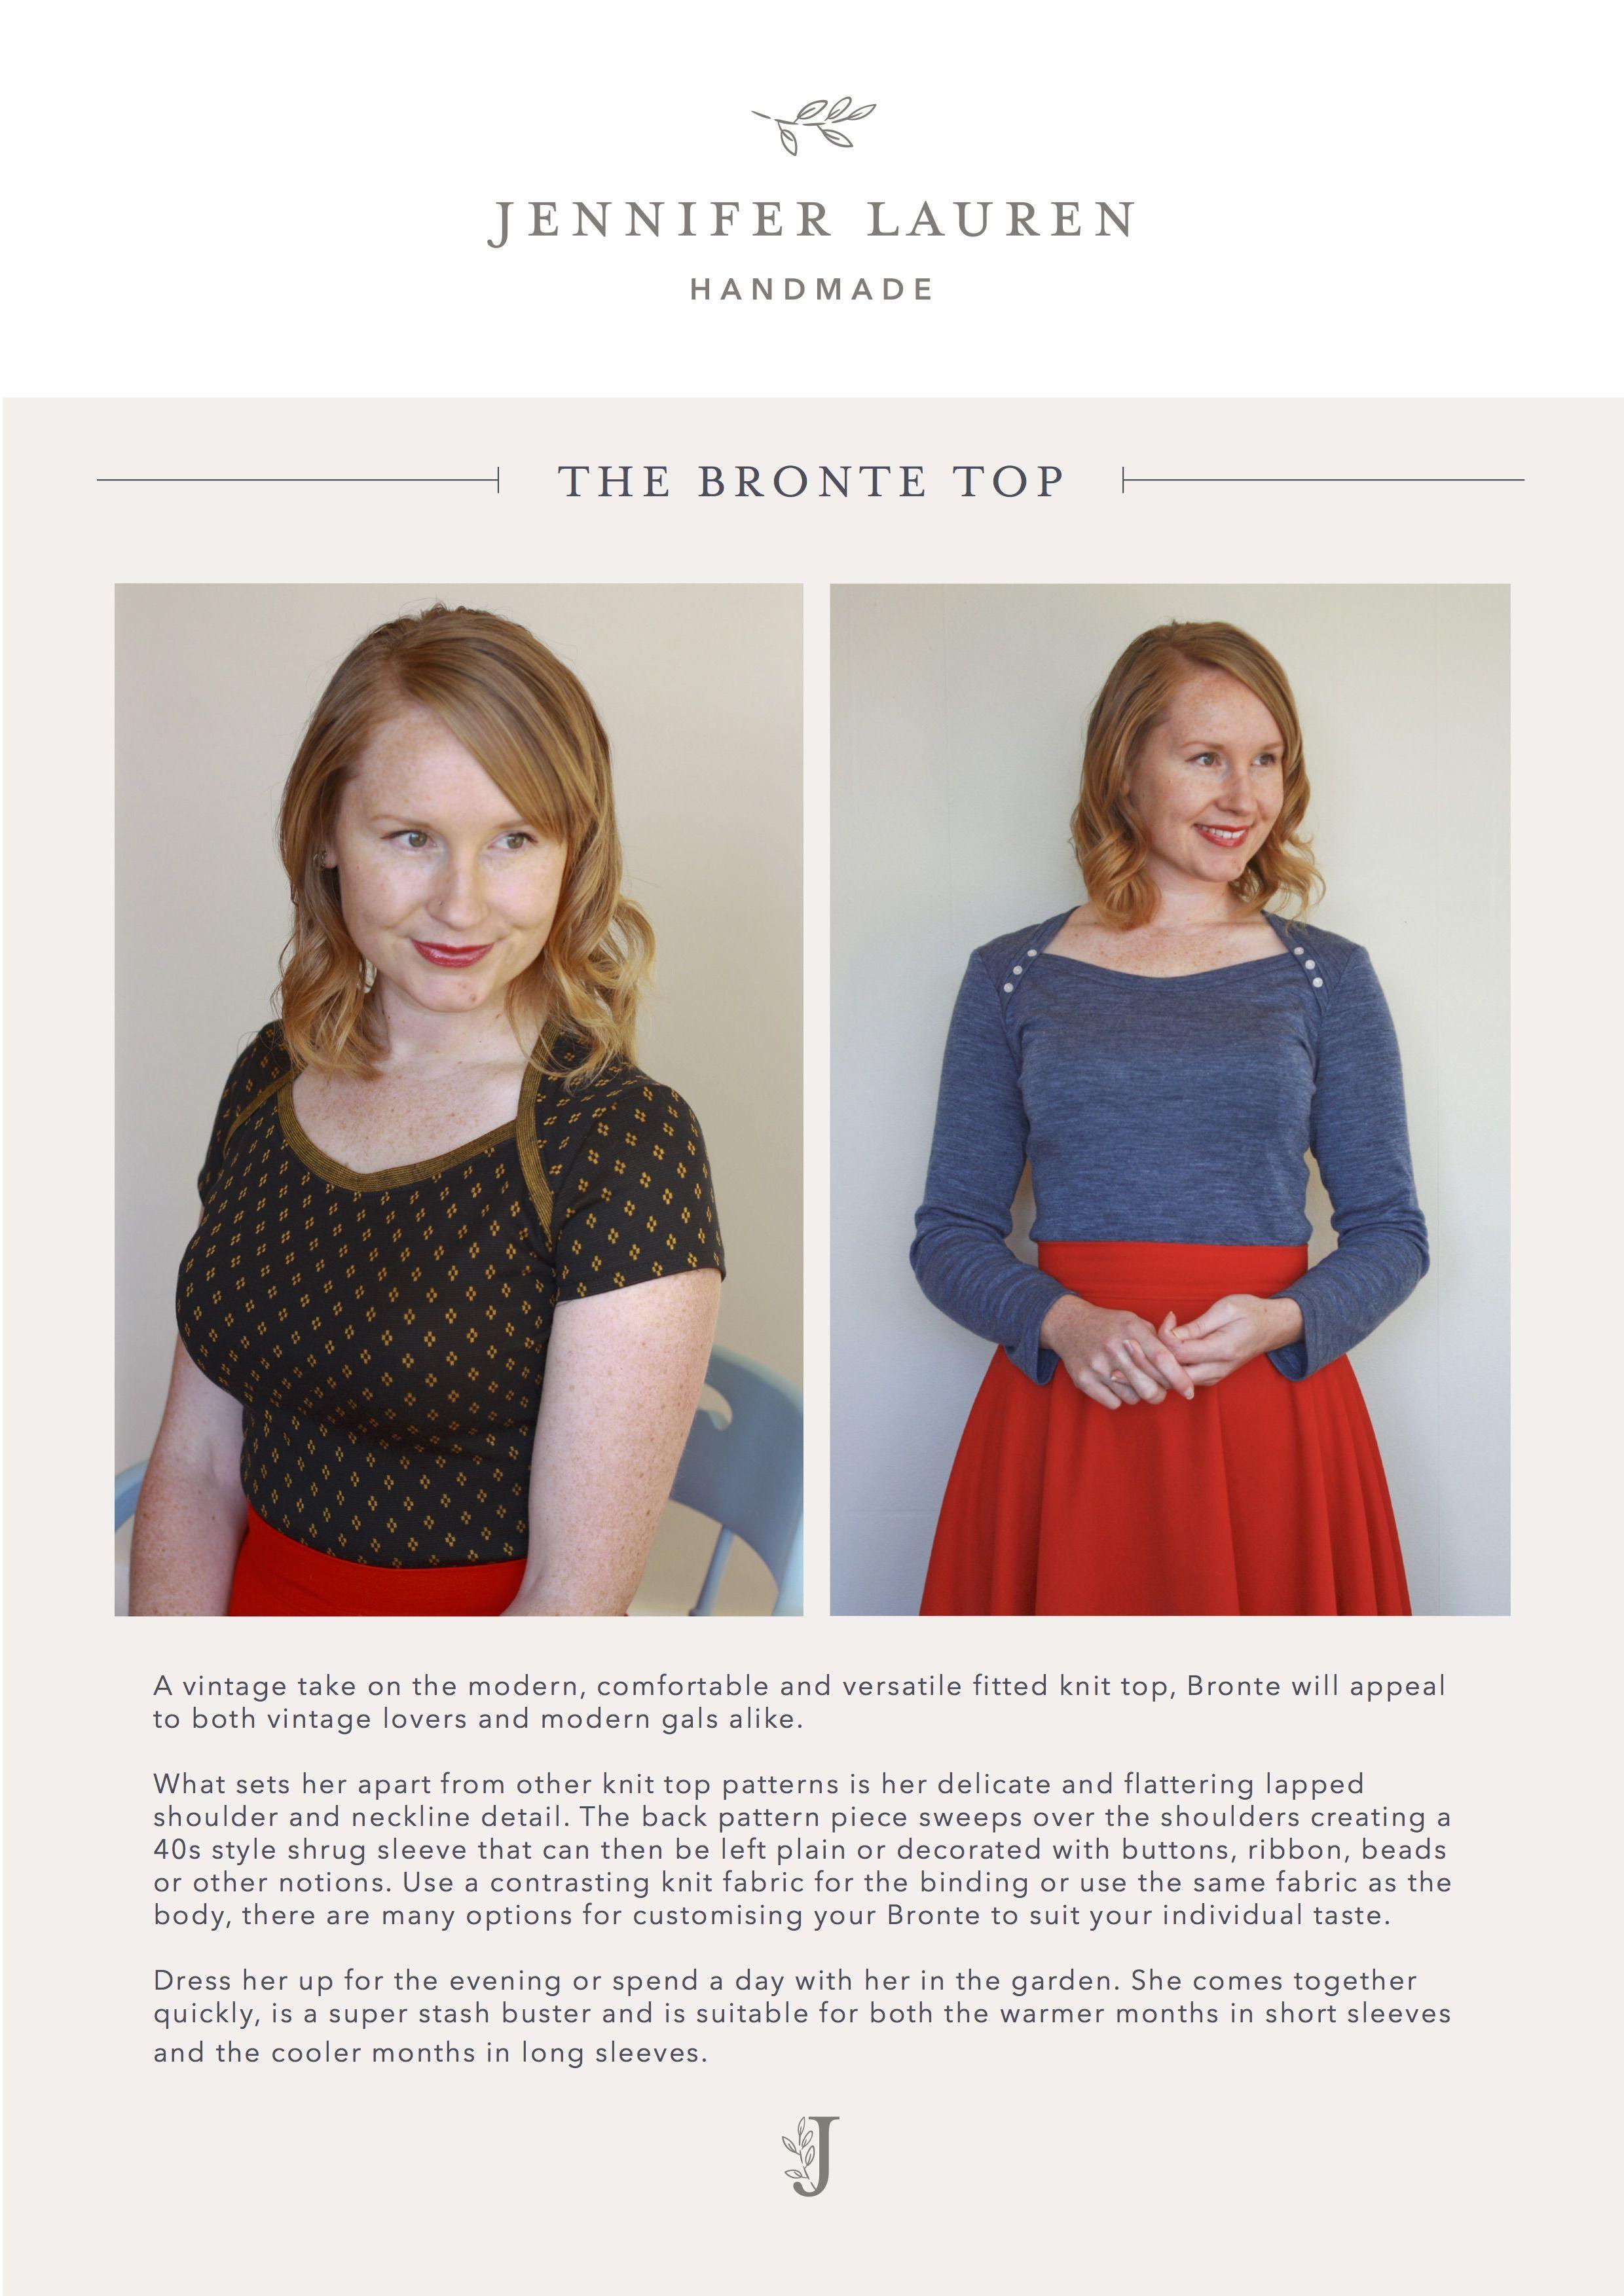 The Bronte Top – Jennifer Lauren Handmade | Apparel Sewing - Fabric ...